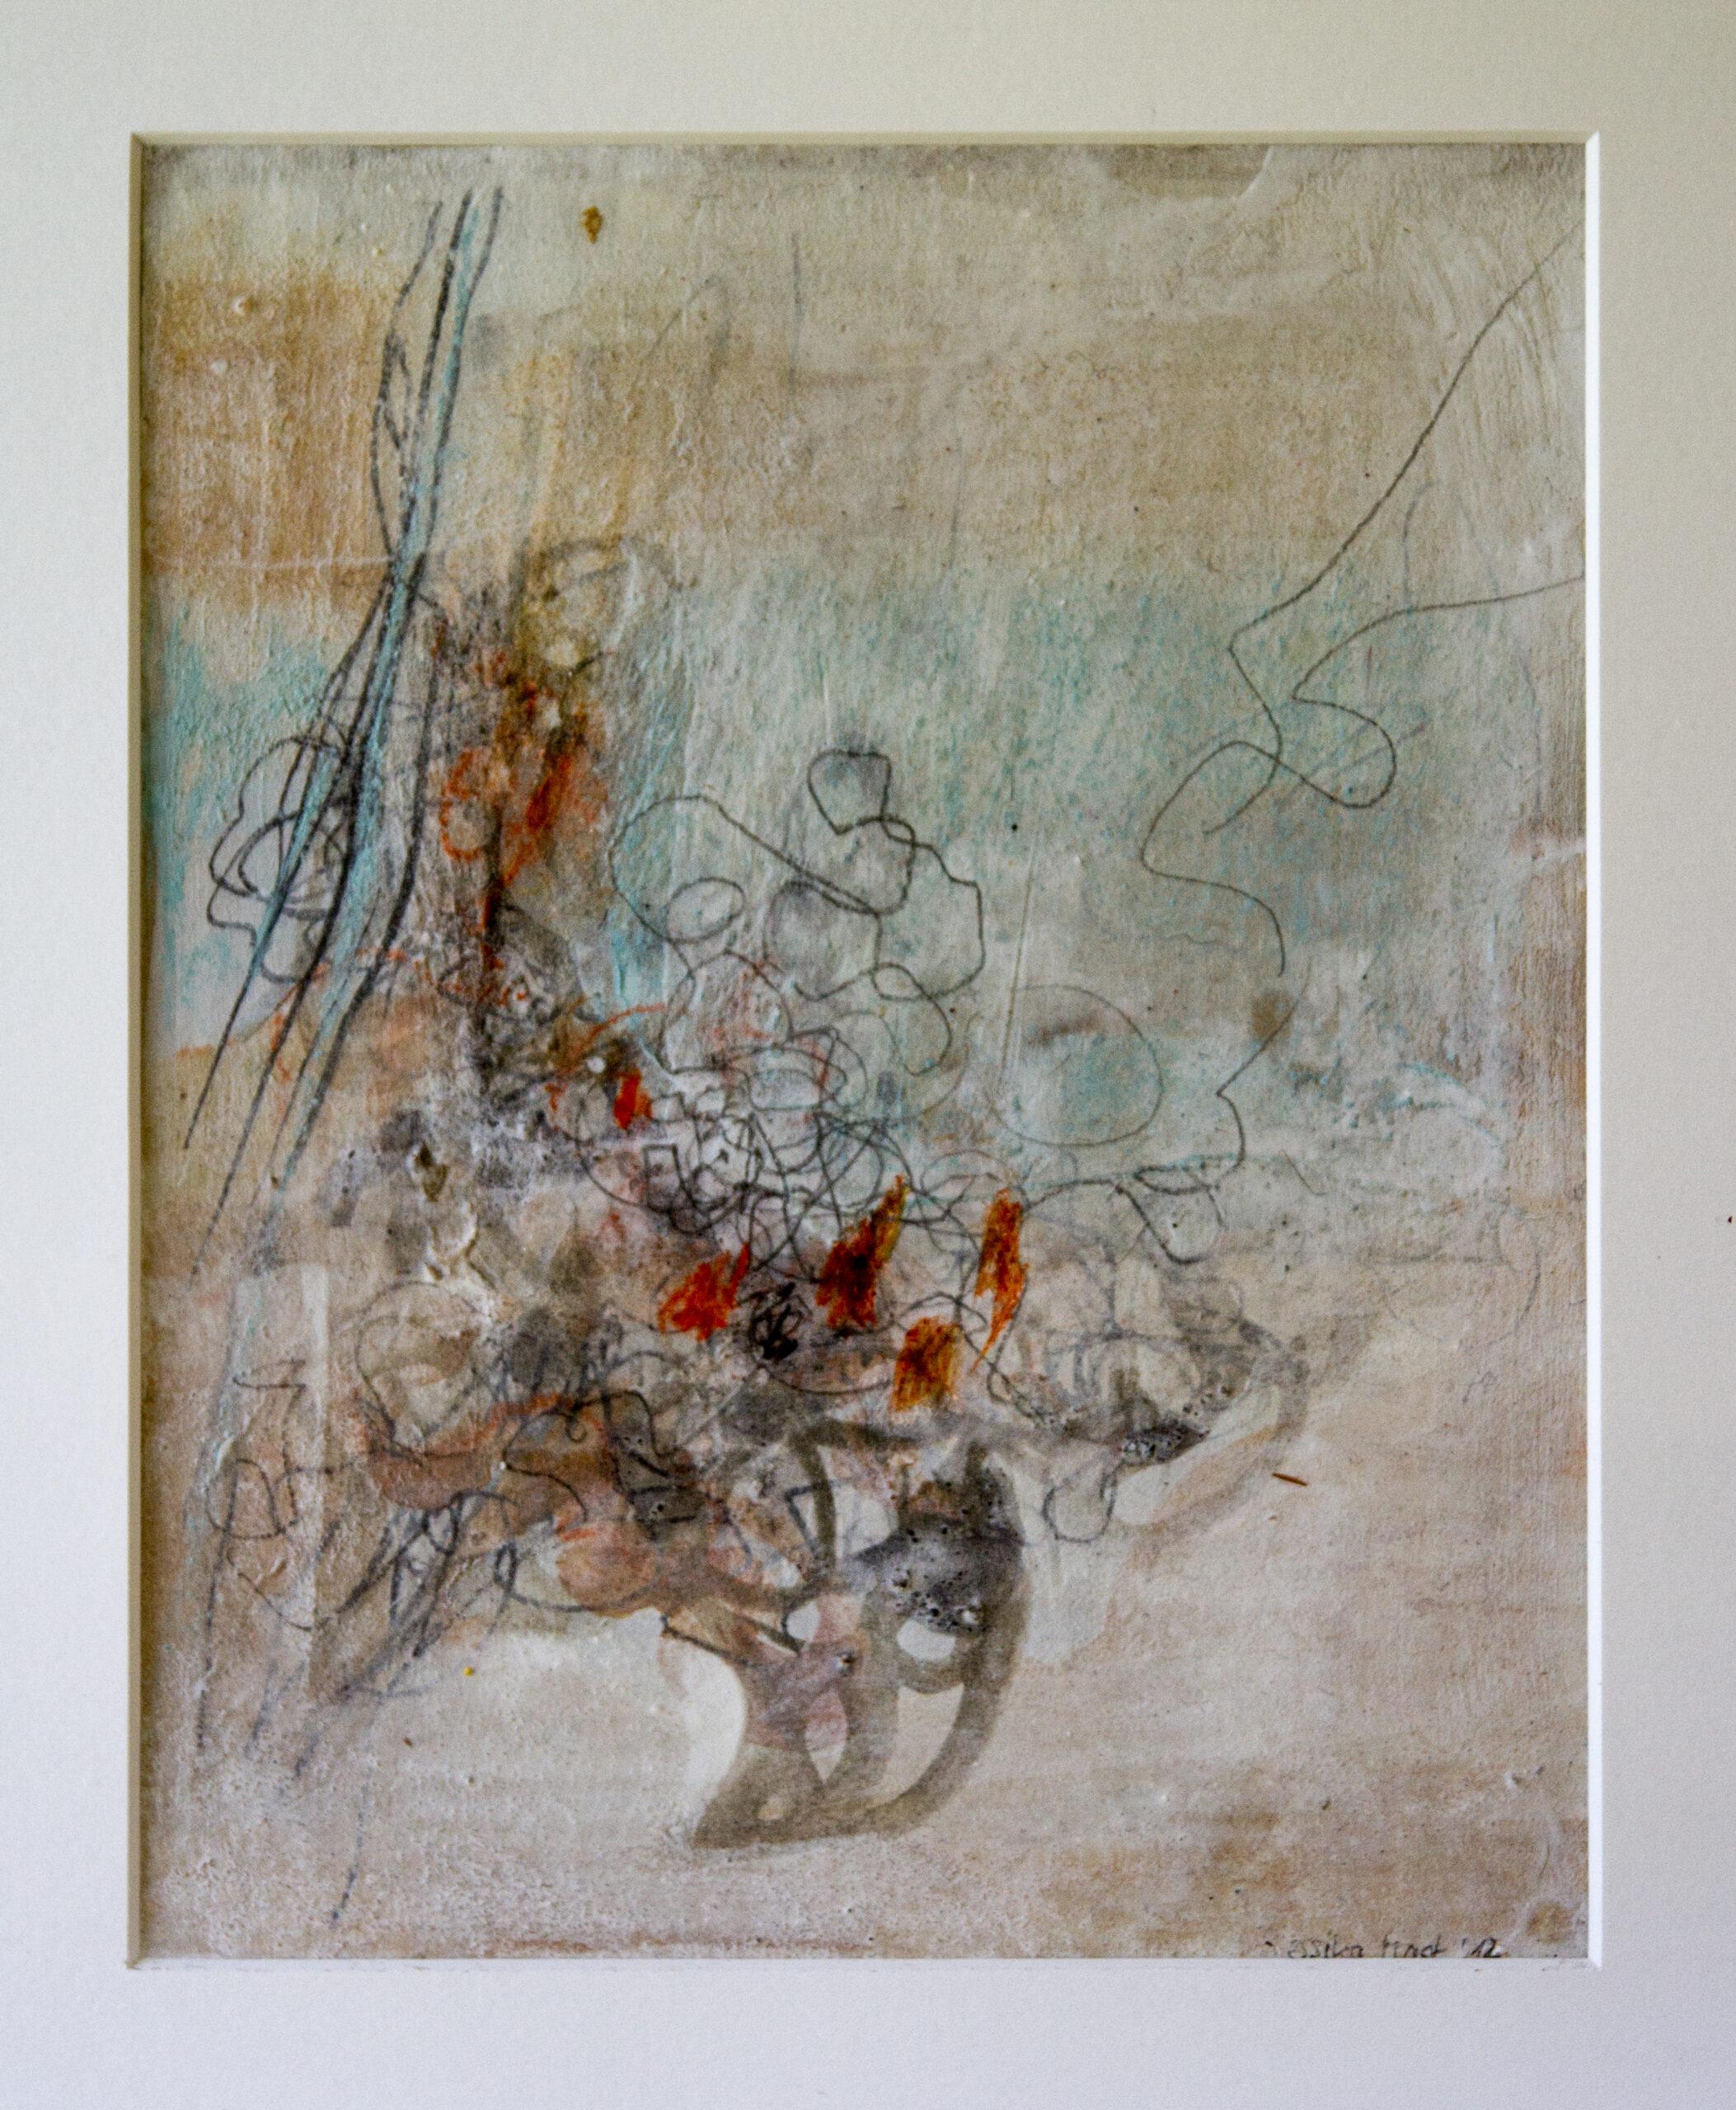 Nebelliebe 3: 30x40,Acryl, Gesteinsmehle, Bleistift, Kreide, Papier auf Papier oder OSB,2012